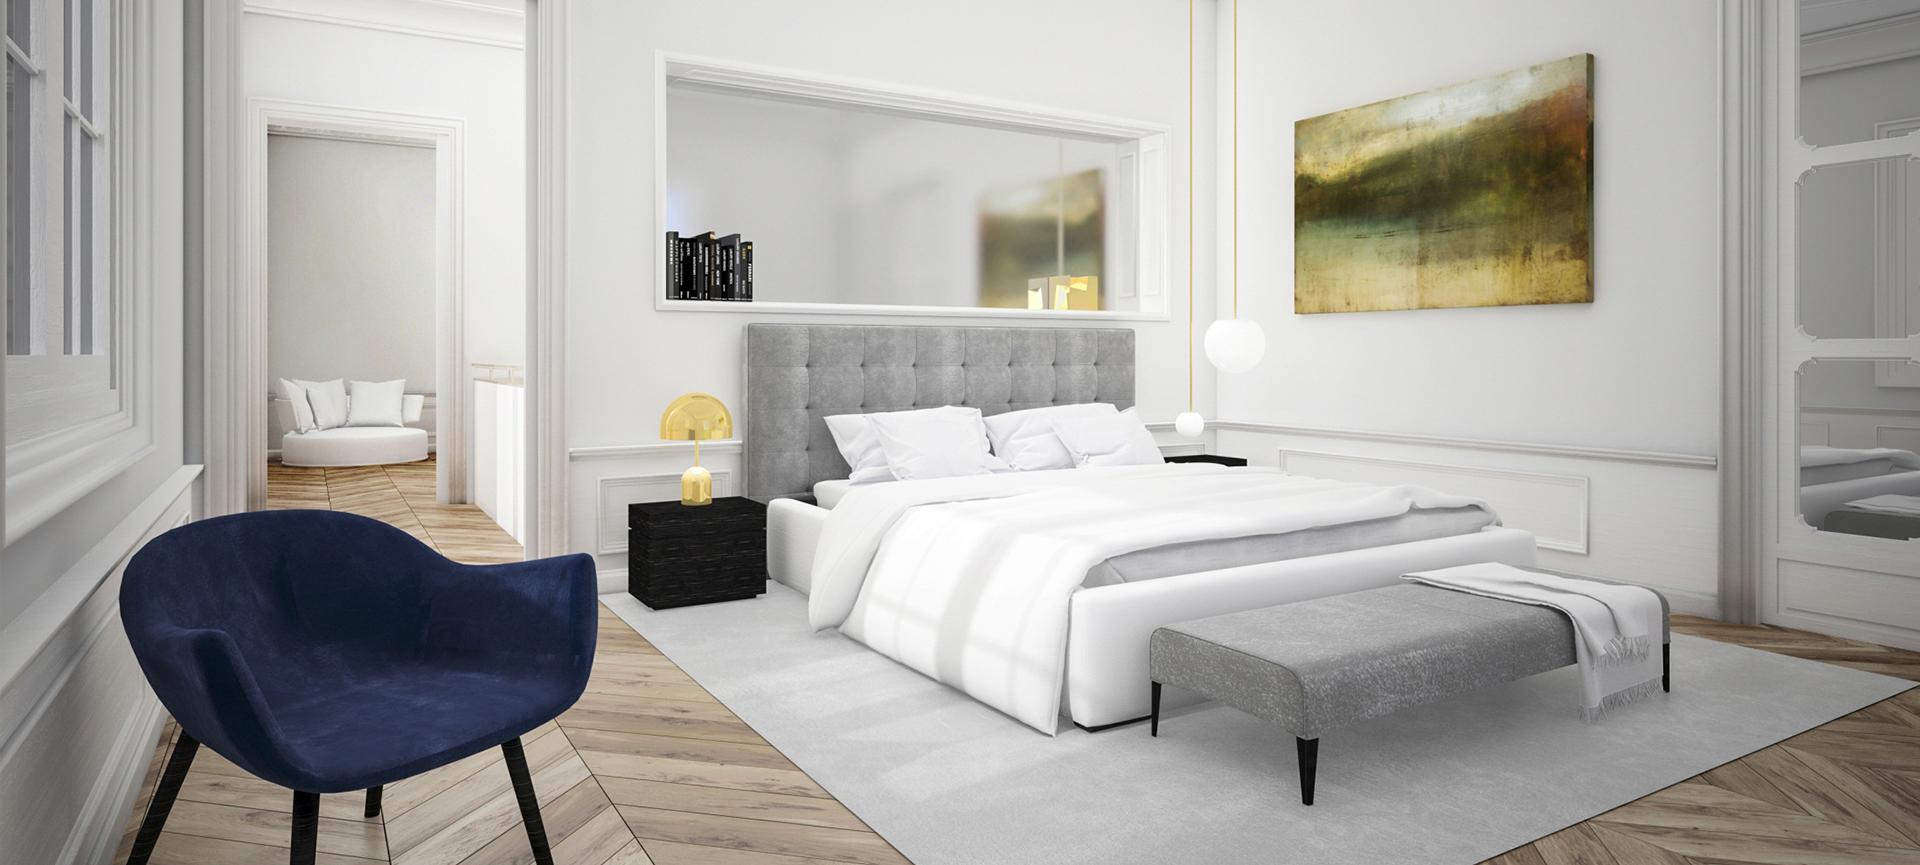 slider-dormitorio1